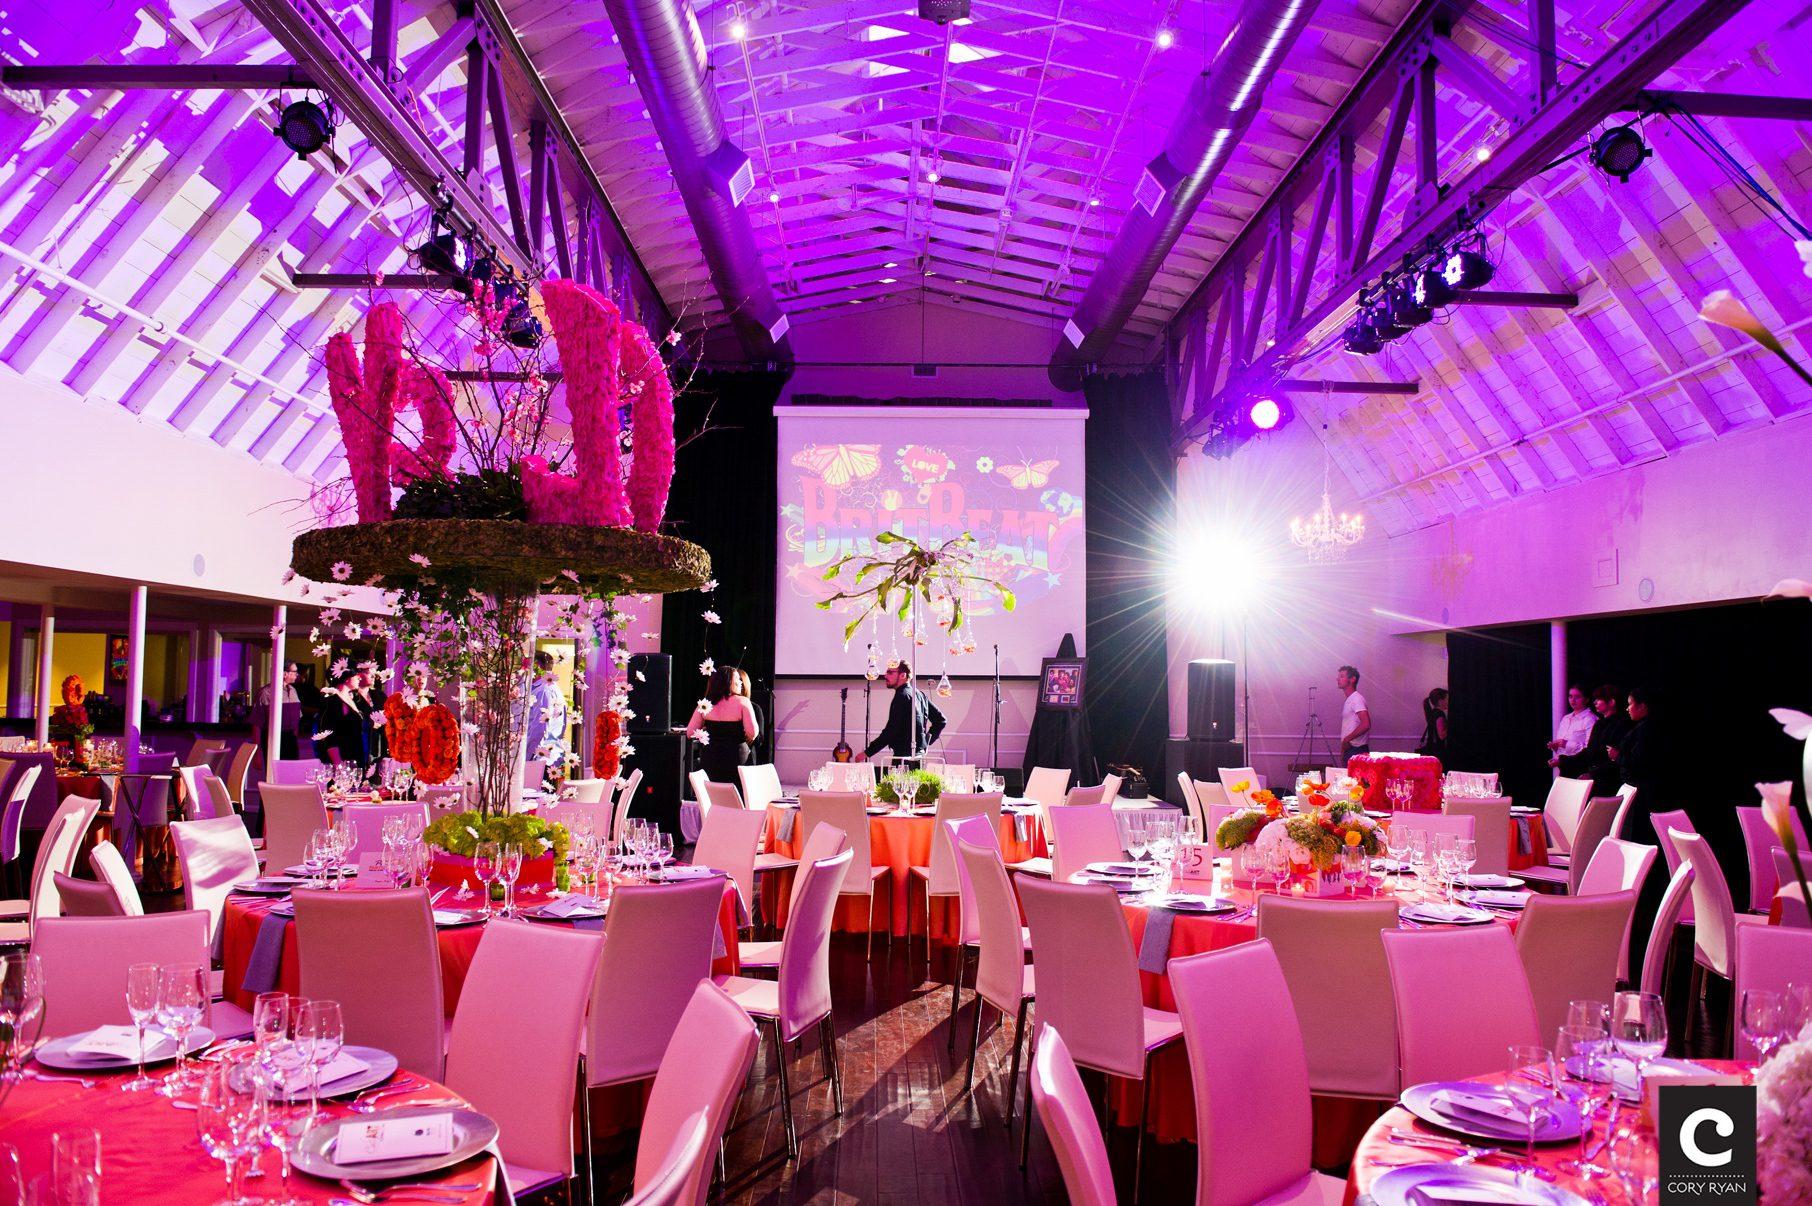 austin event photographer corporate parties events conventions